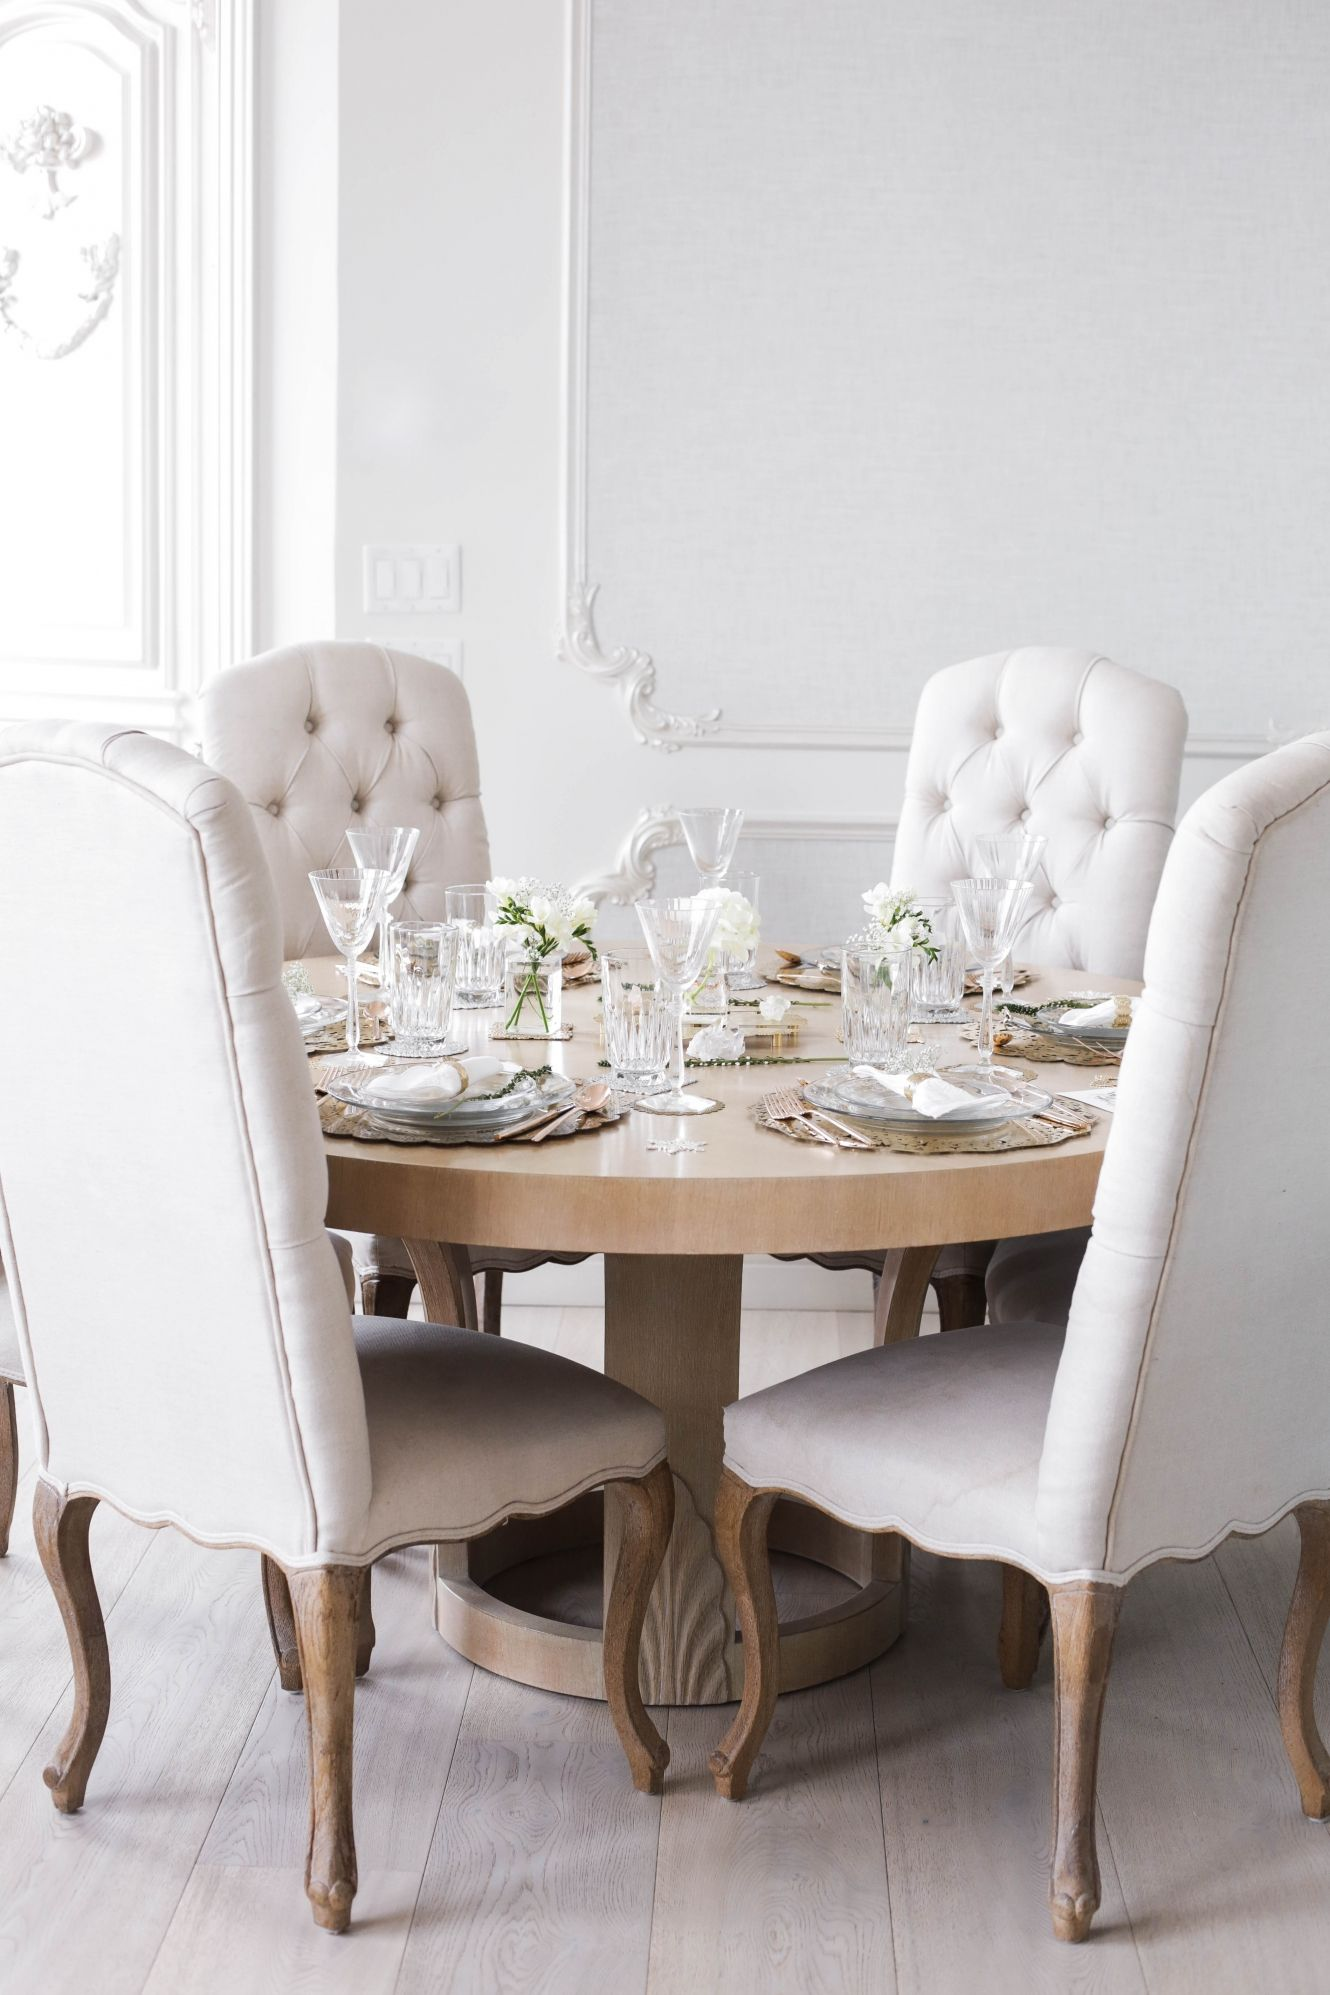 Dinner Party Spotlight Ariana Ost Fashionable Hostess Fashionable Hostess Decorating Your Home Home Decor